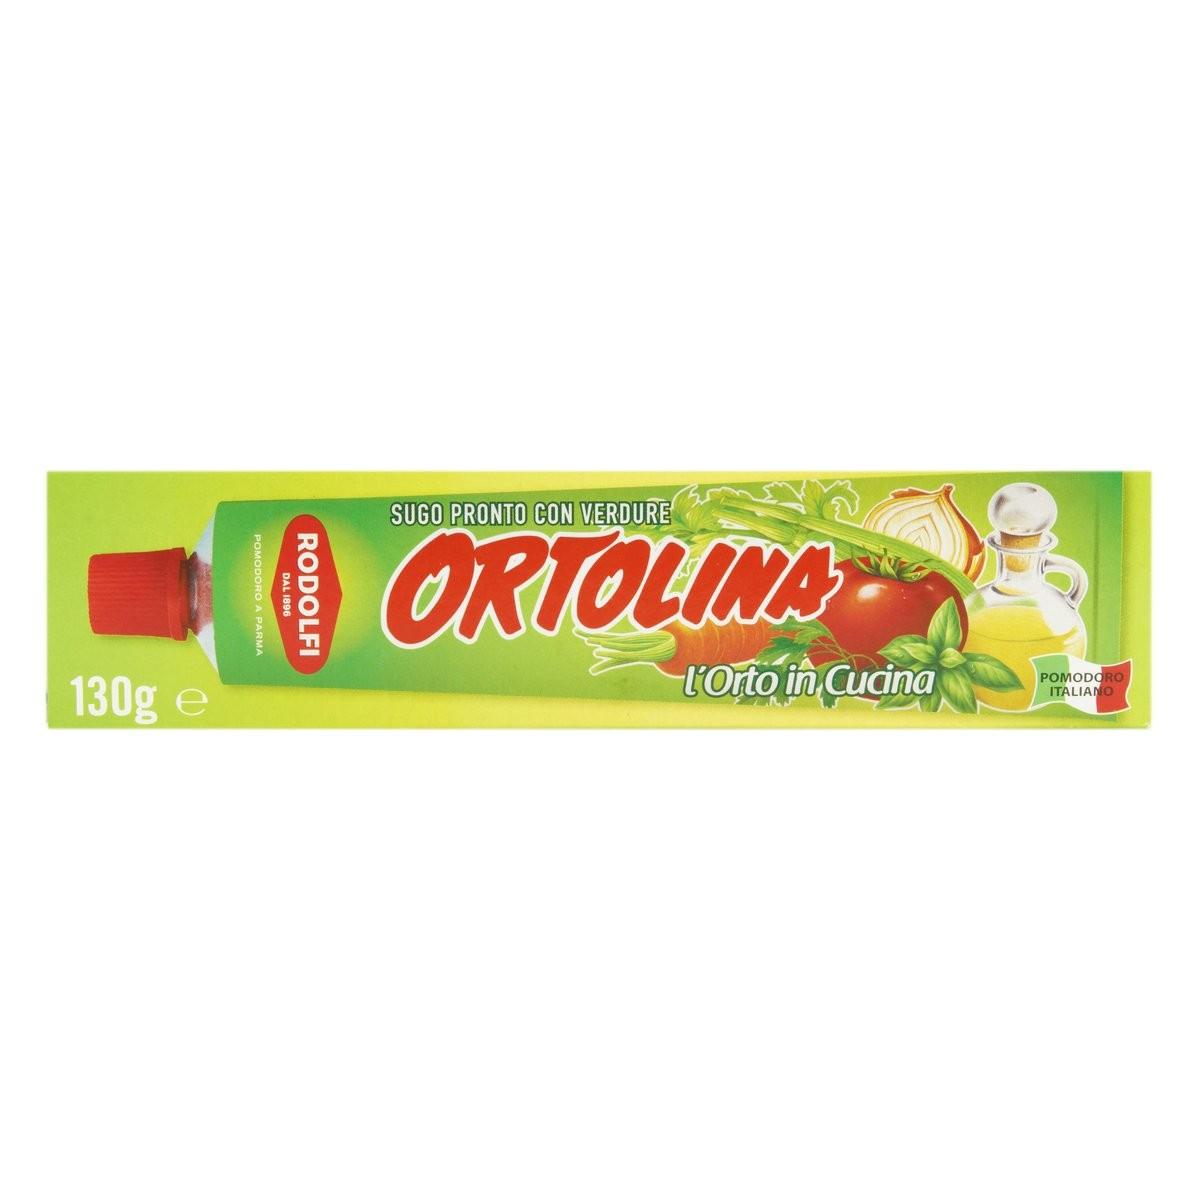 Rodolfi Sugo pronto con verdure Ortolina